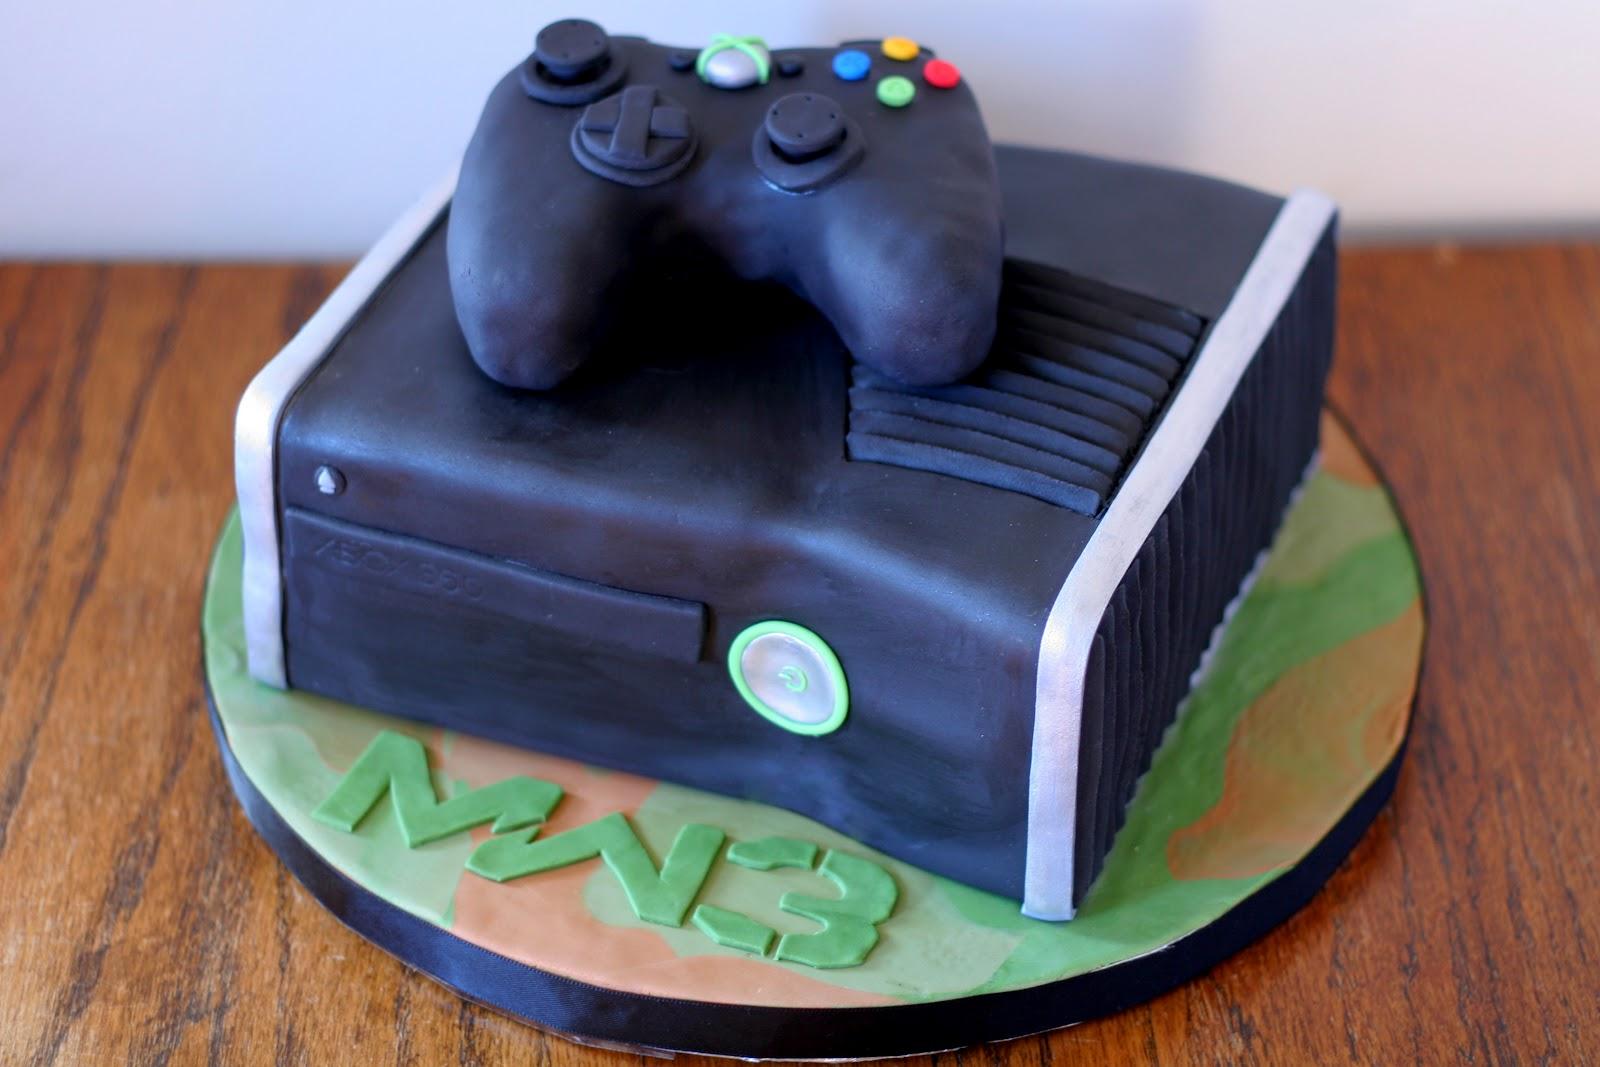 Stuff By Stace Xbox Call Of Duty Modern Warfare 3 Cake